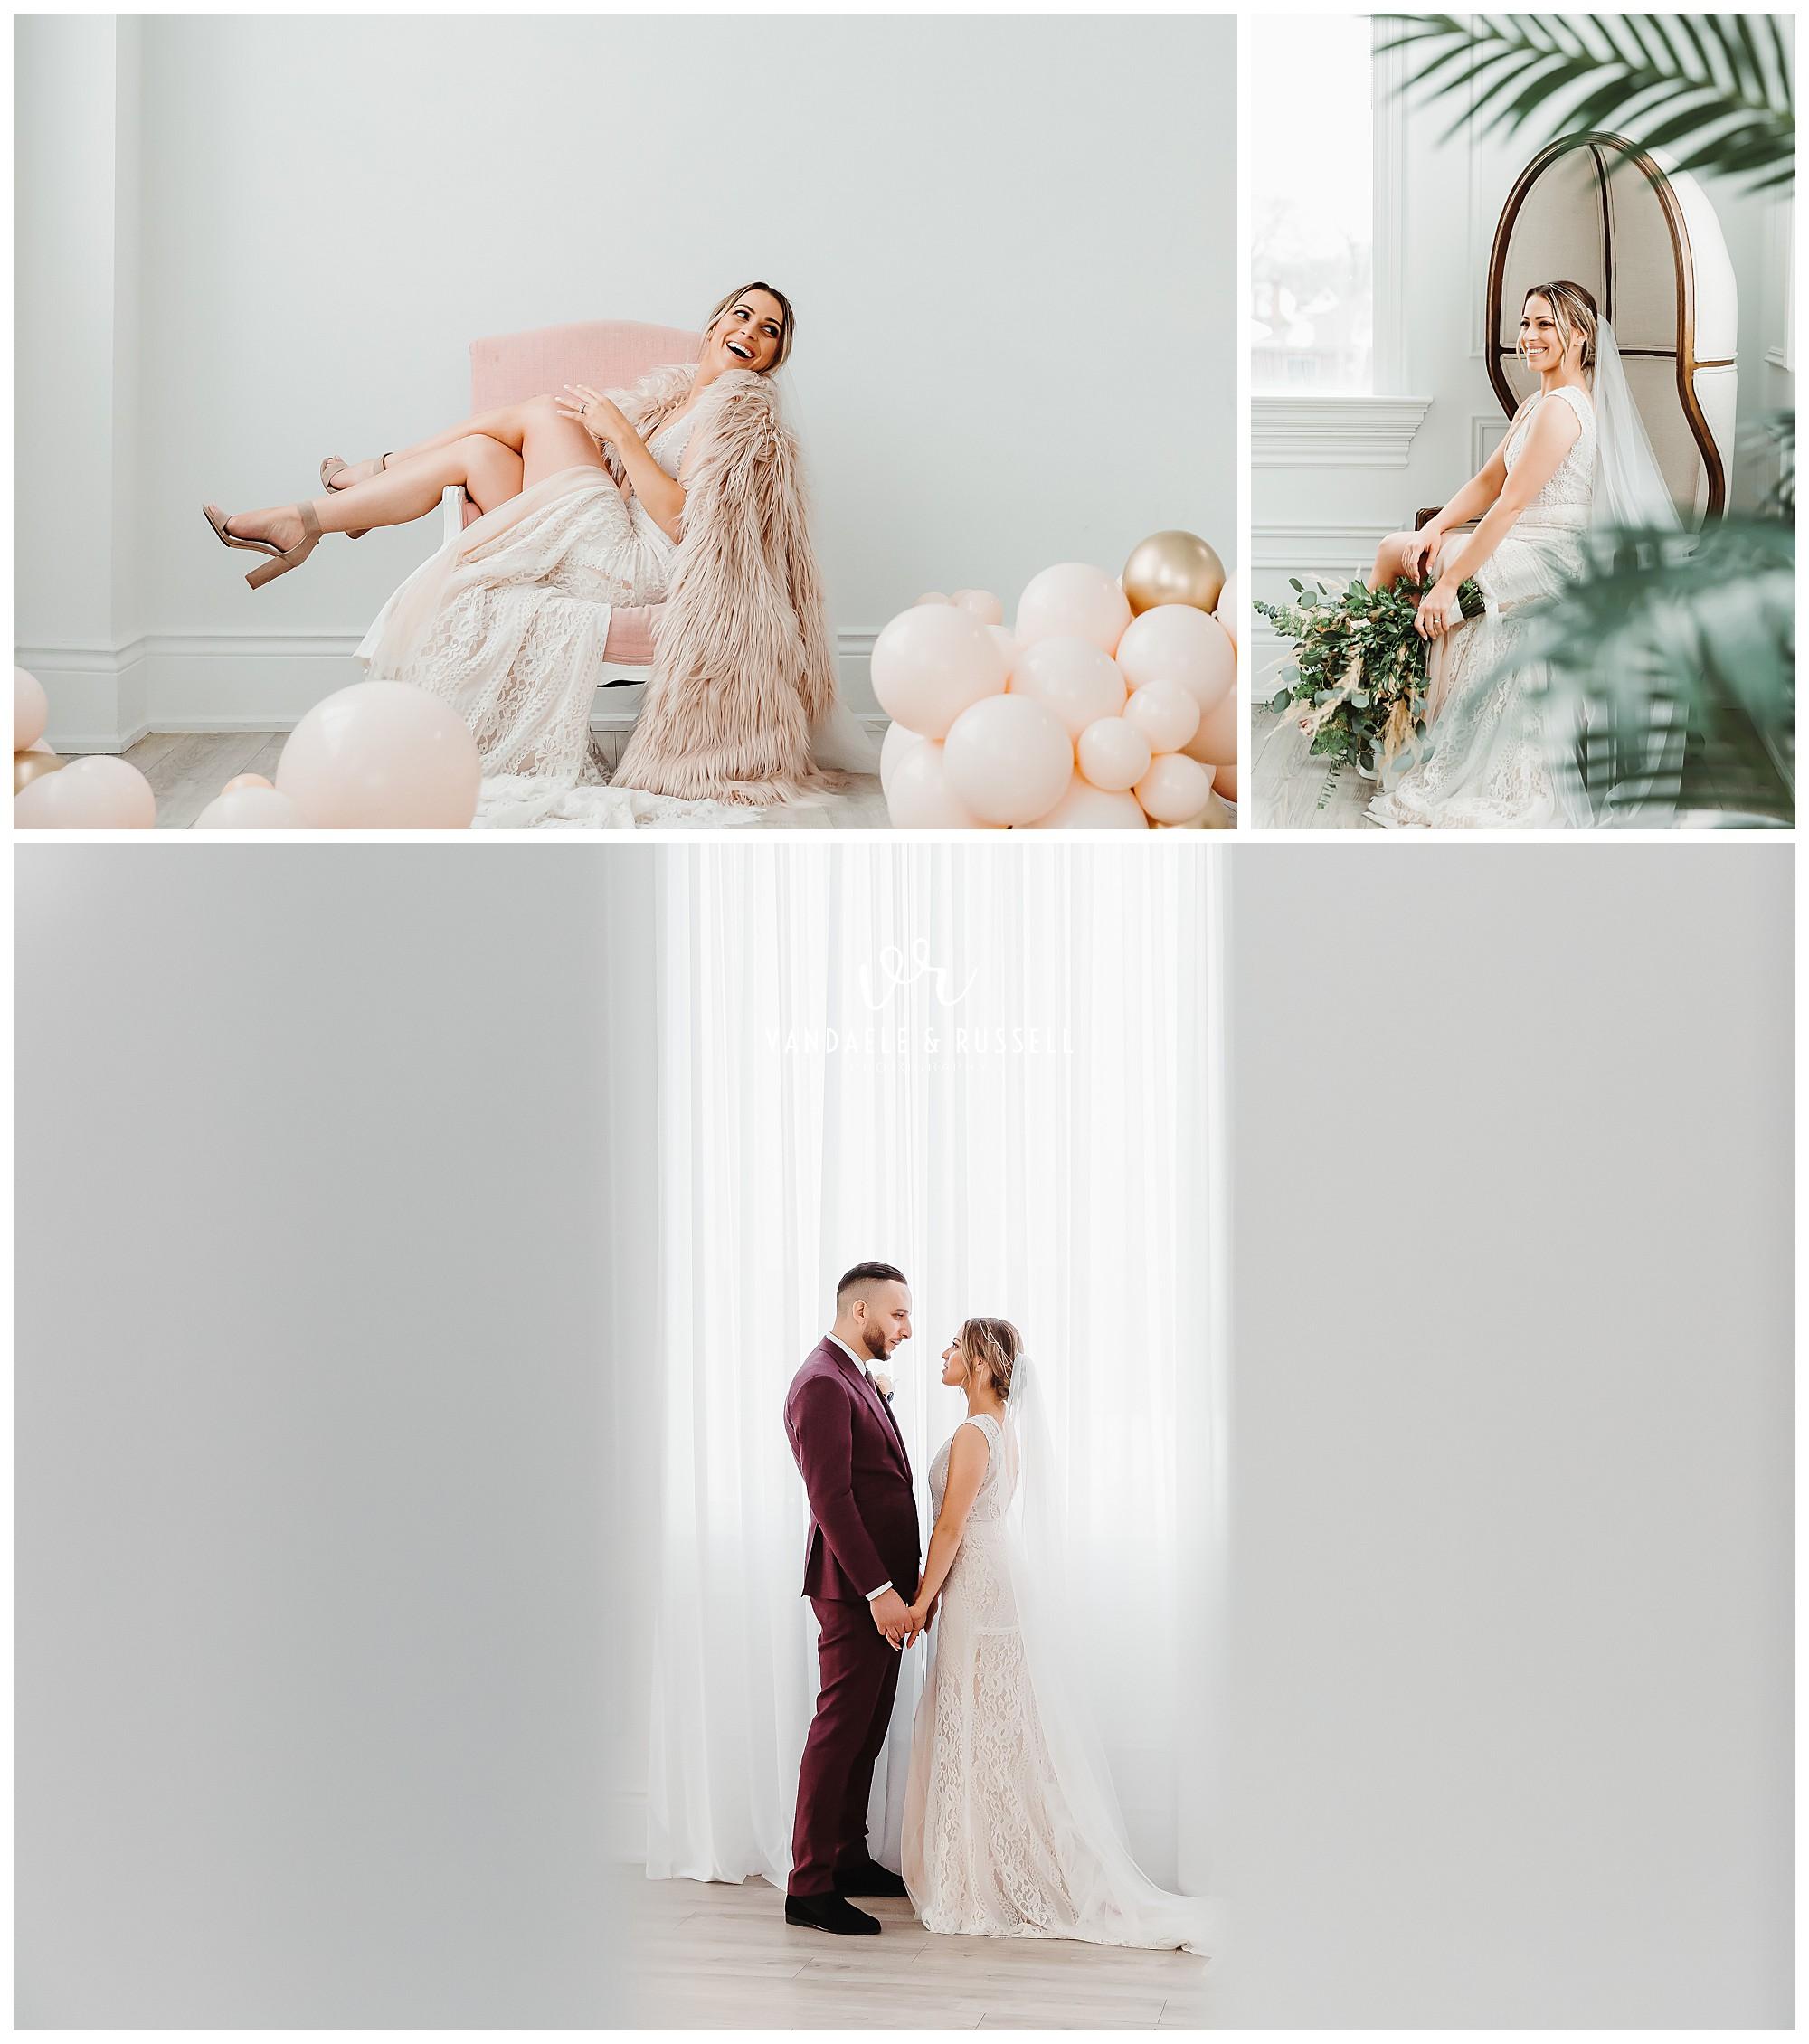 Joanna-Christos-Grand-Luxe-Wedding-Photos-Mint-Room-Toronto-VanDaele-Russell_0085.jpg